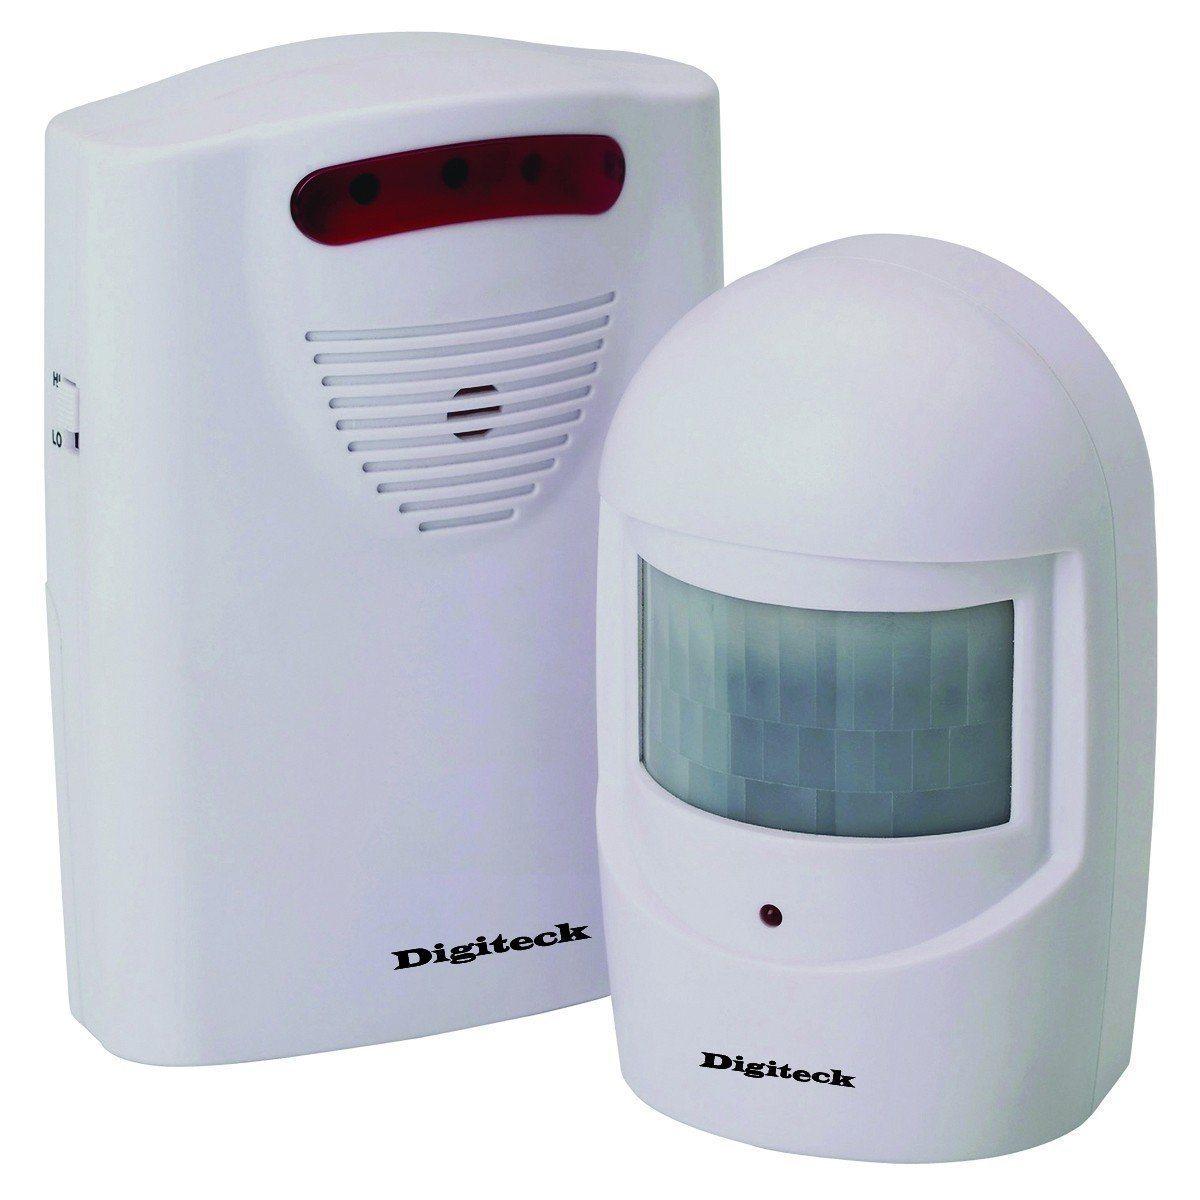 A9- DIY Wireless Weatherproof Garden, Shed, Driveway, Garage, Outbuilding Burglar Security Alarm